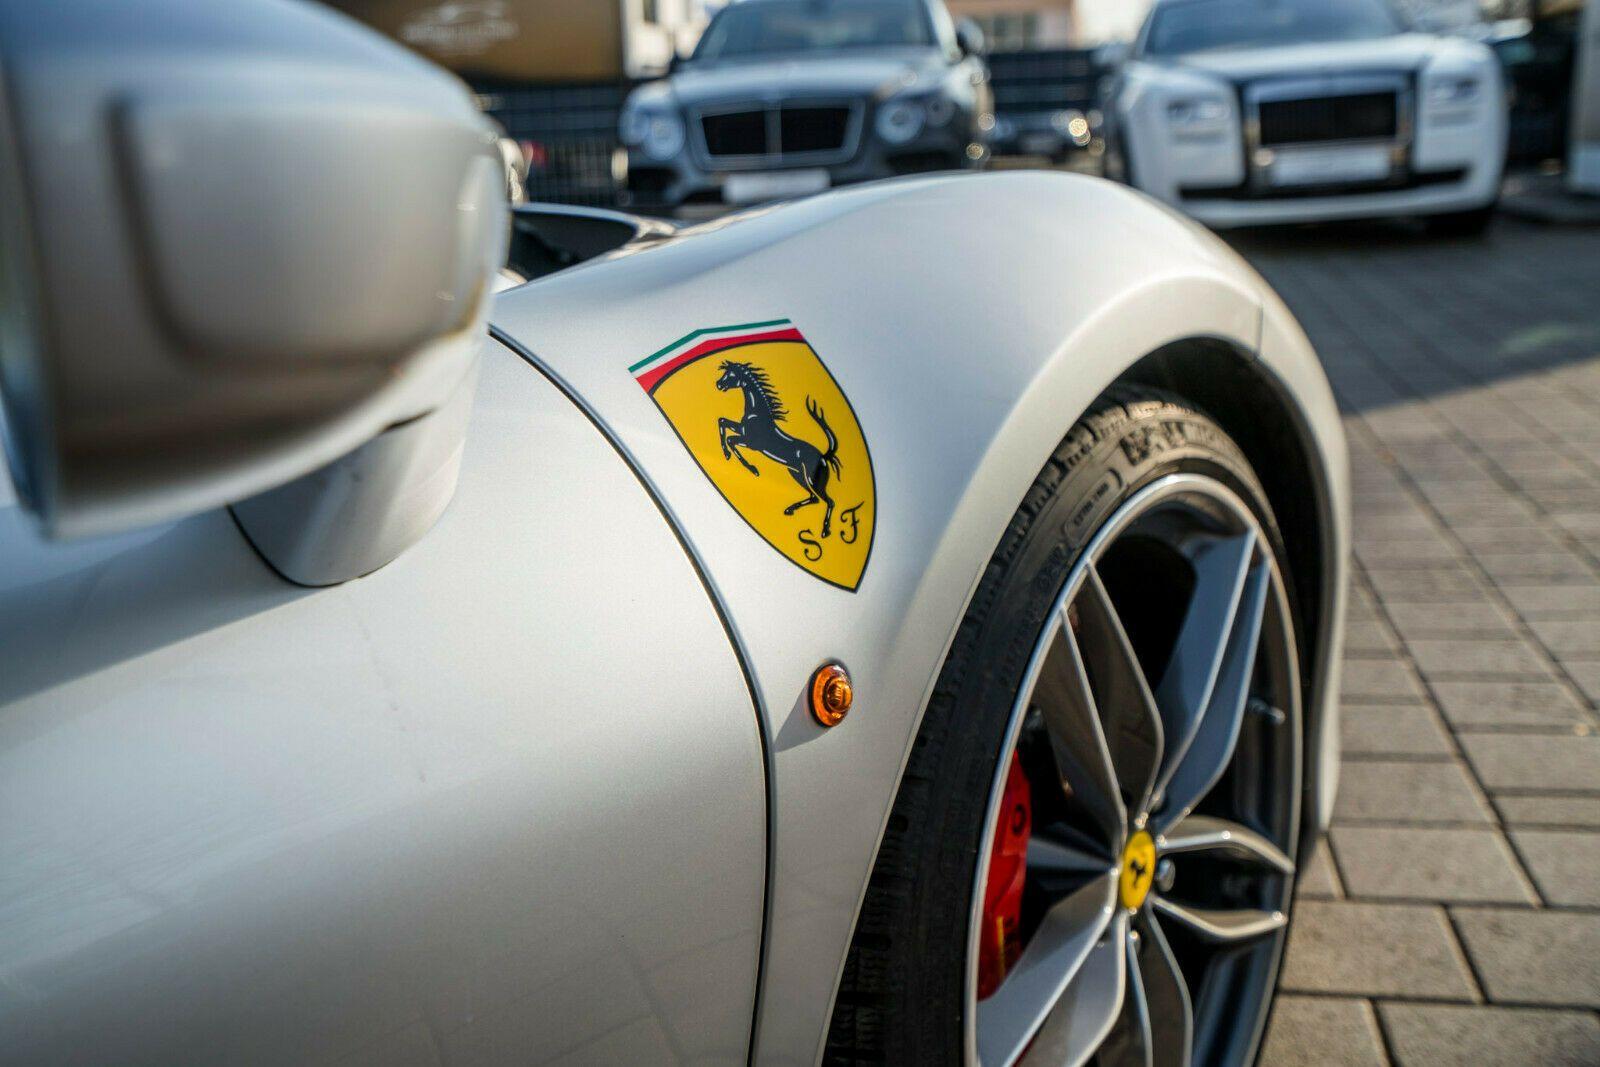 Ferrari 488 Spider Luxury Pulse Cars Germany For Sale On Luxurypulse Ferrari 488 Superauto Rennstreifen